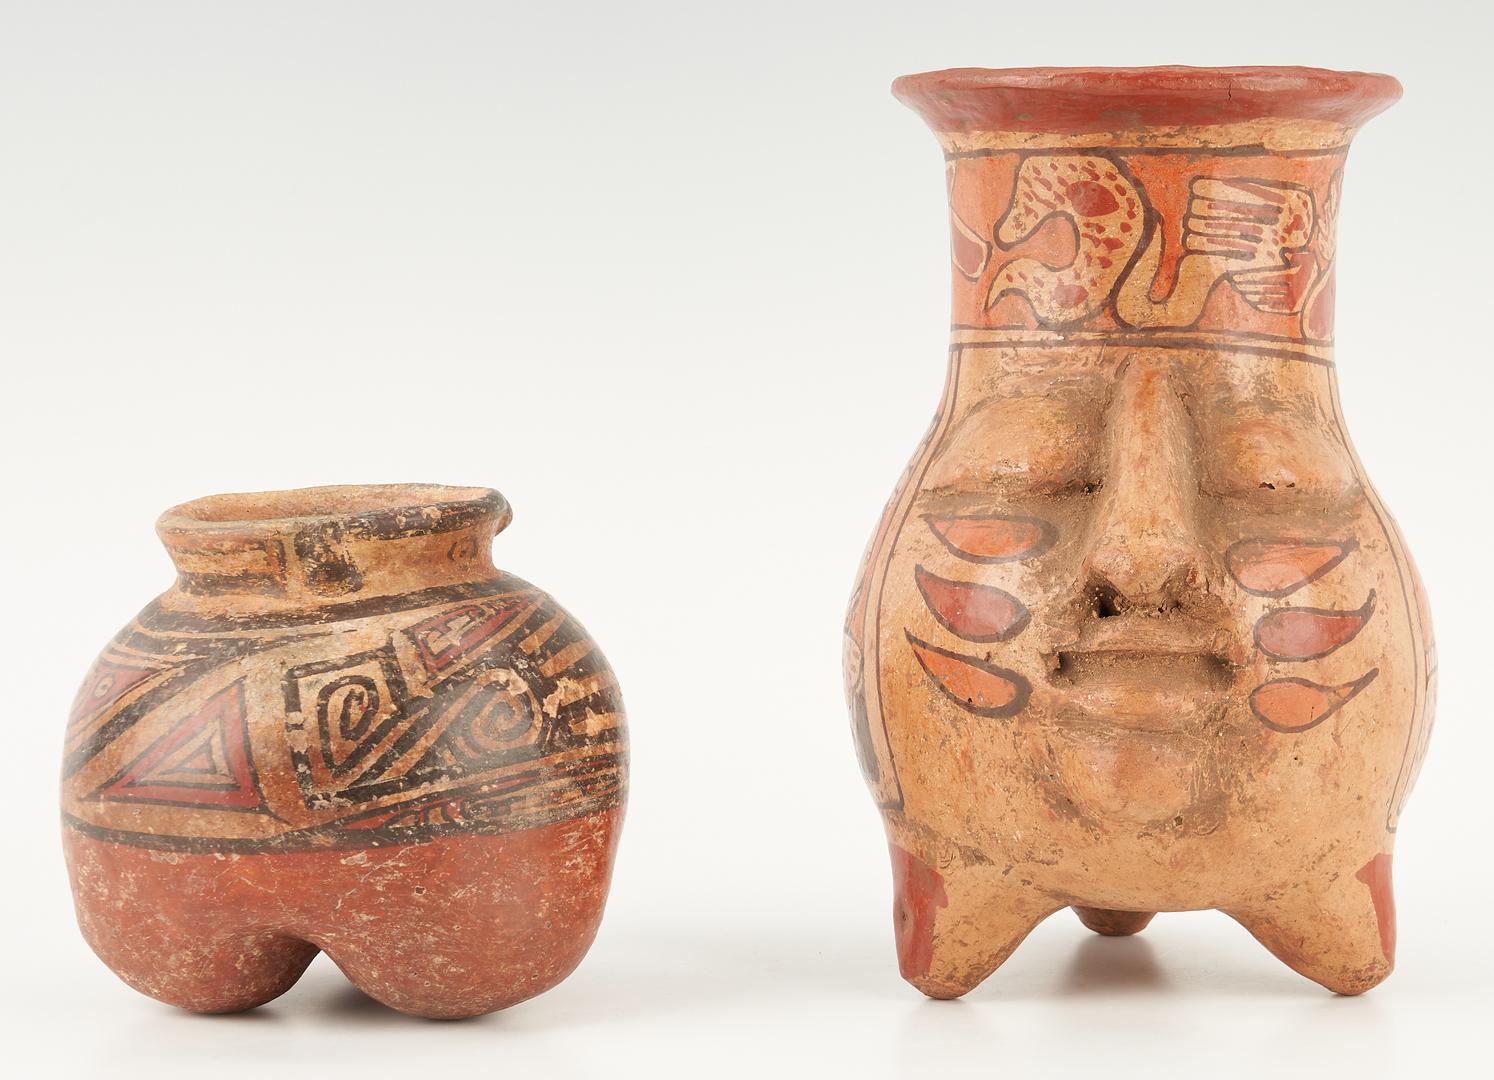 Lot 691: Pre-Columbian Panamanian Cocle Small Tripod Jar